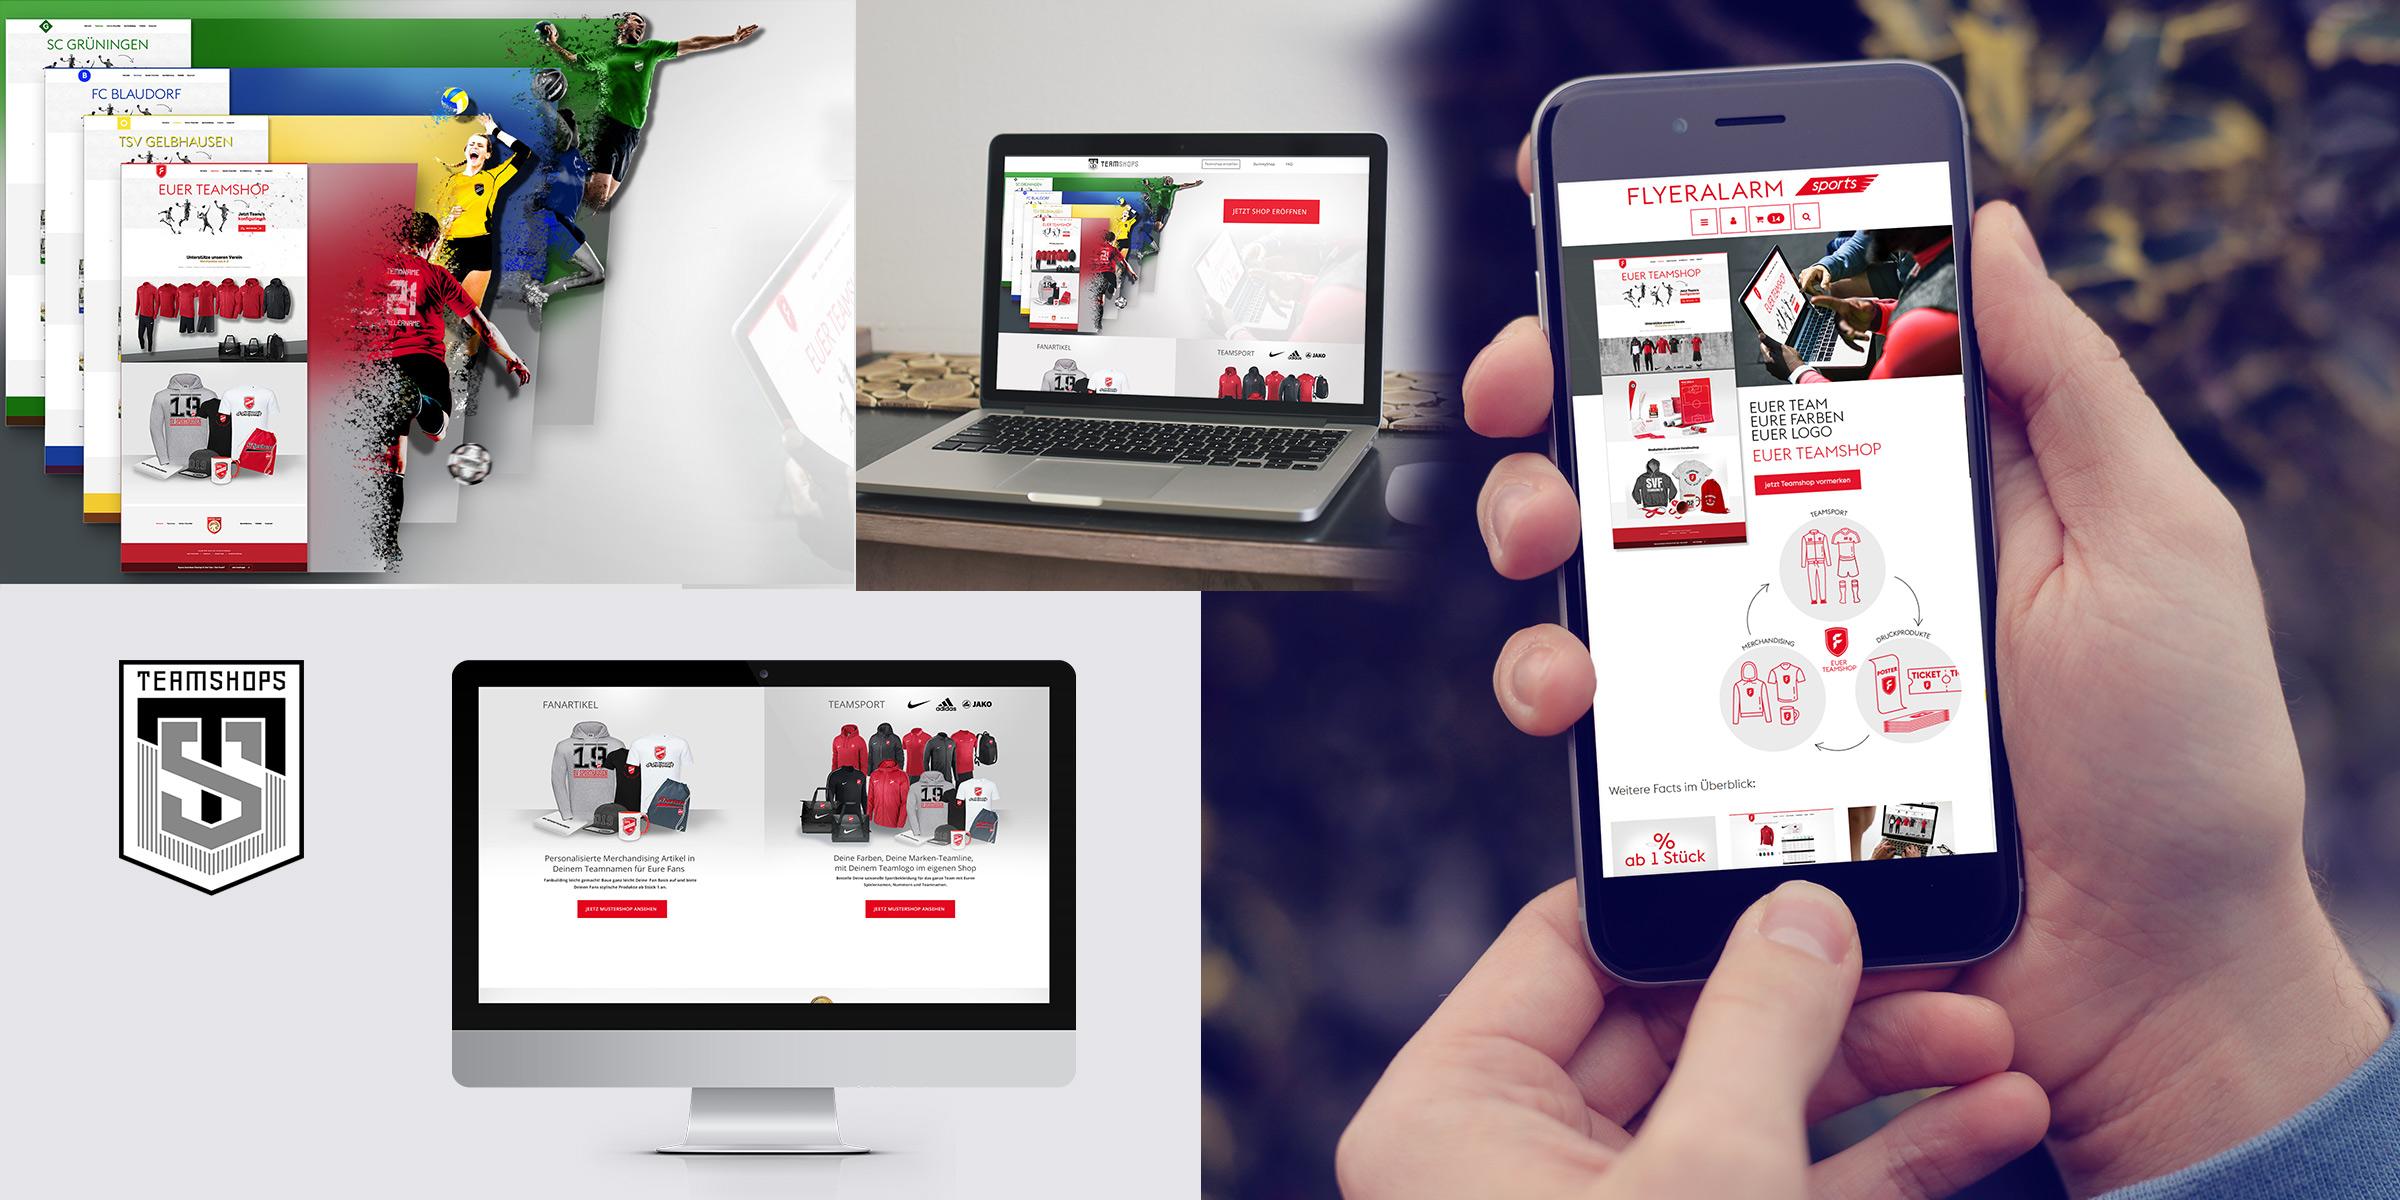 17 gfd gregor fenger designworks for fa sports branding corporate design smm sma social media marketing online